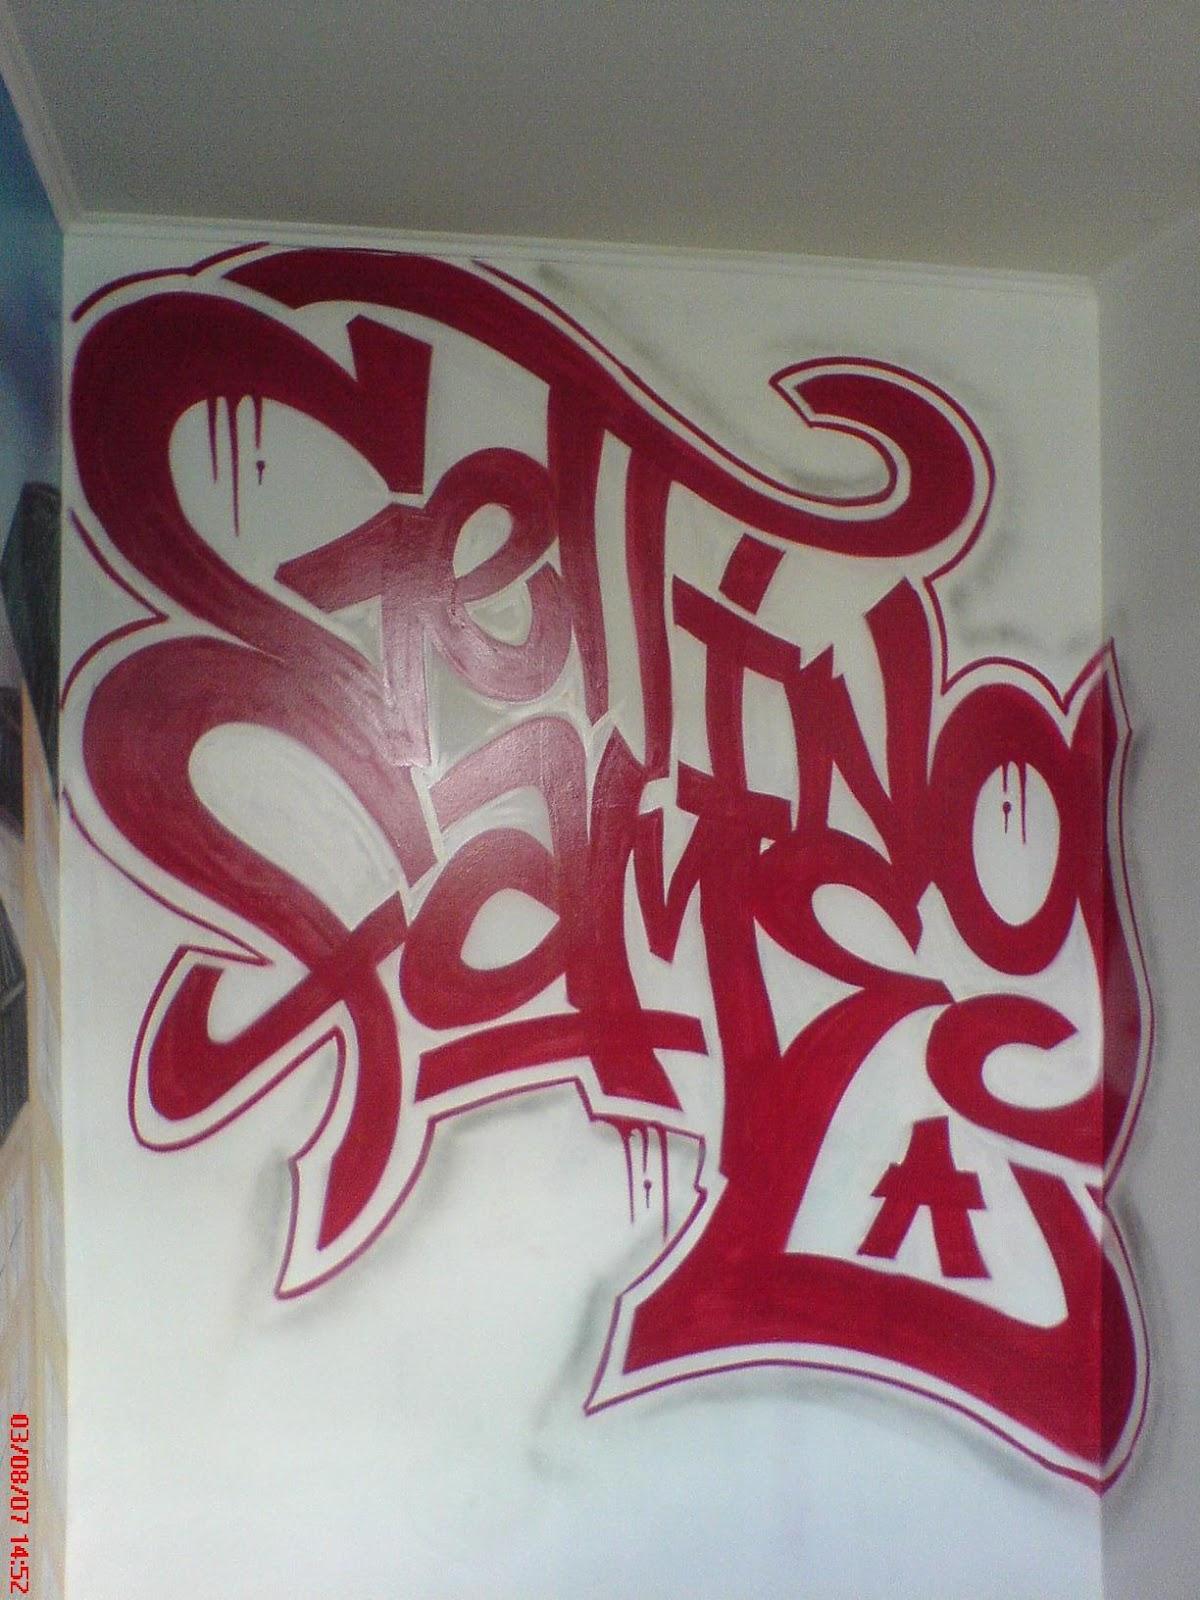 creation dune chambre d 39 ado graffiti graffeur pro. Black Bedroom Furniture Sets. Home Design Ideas